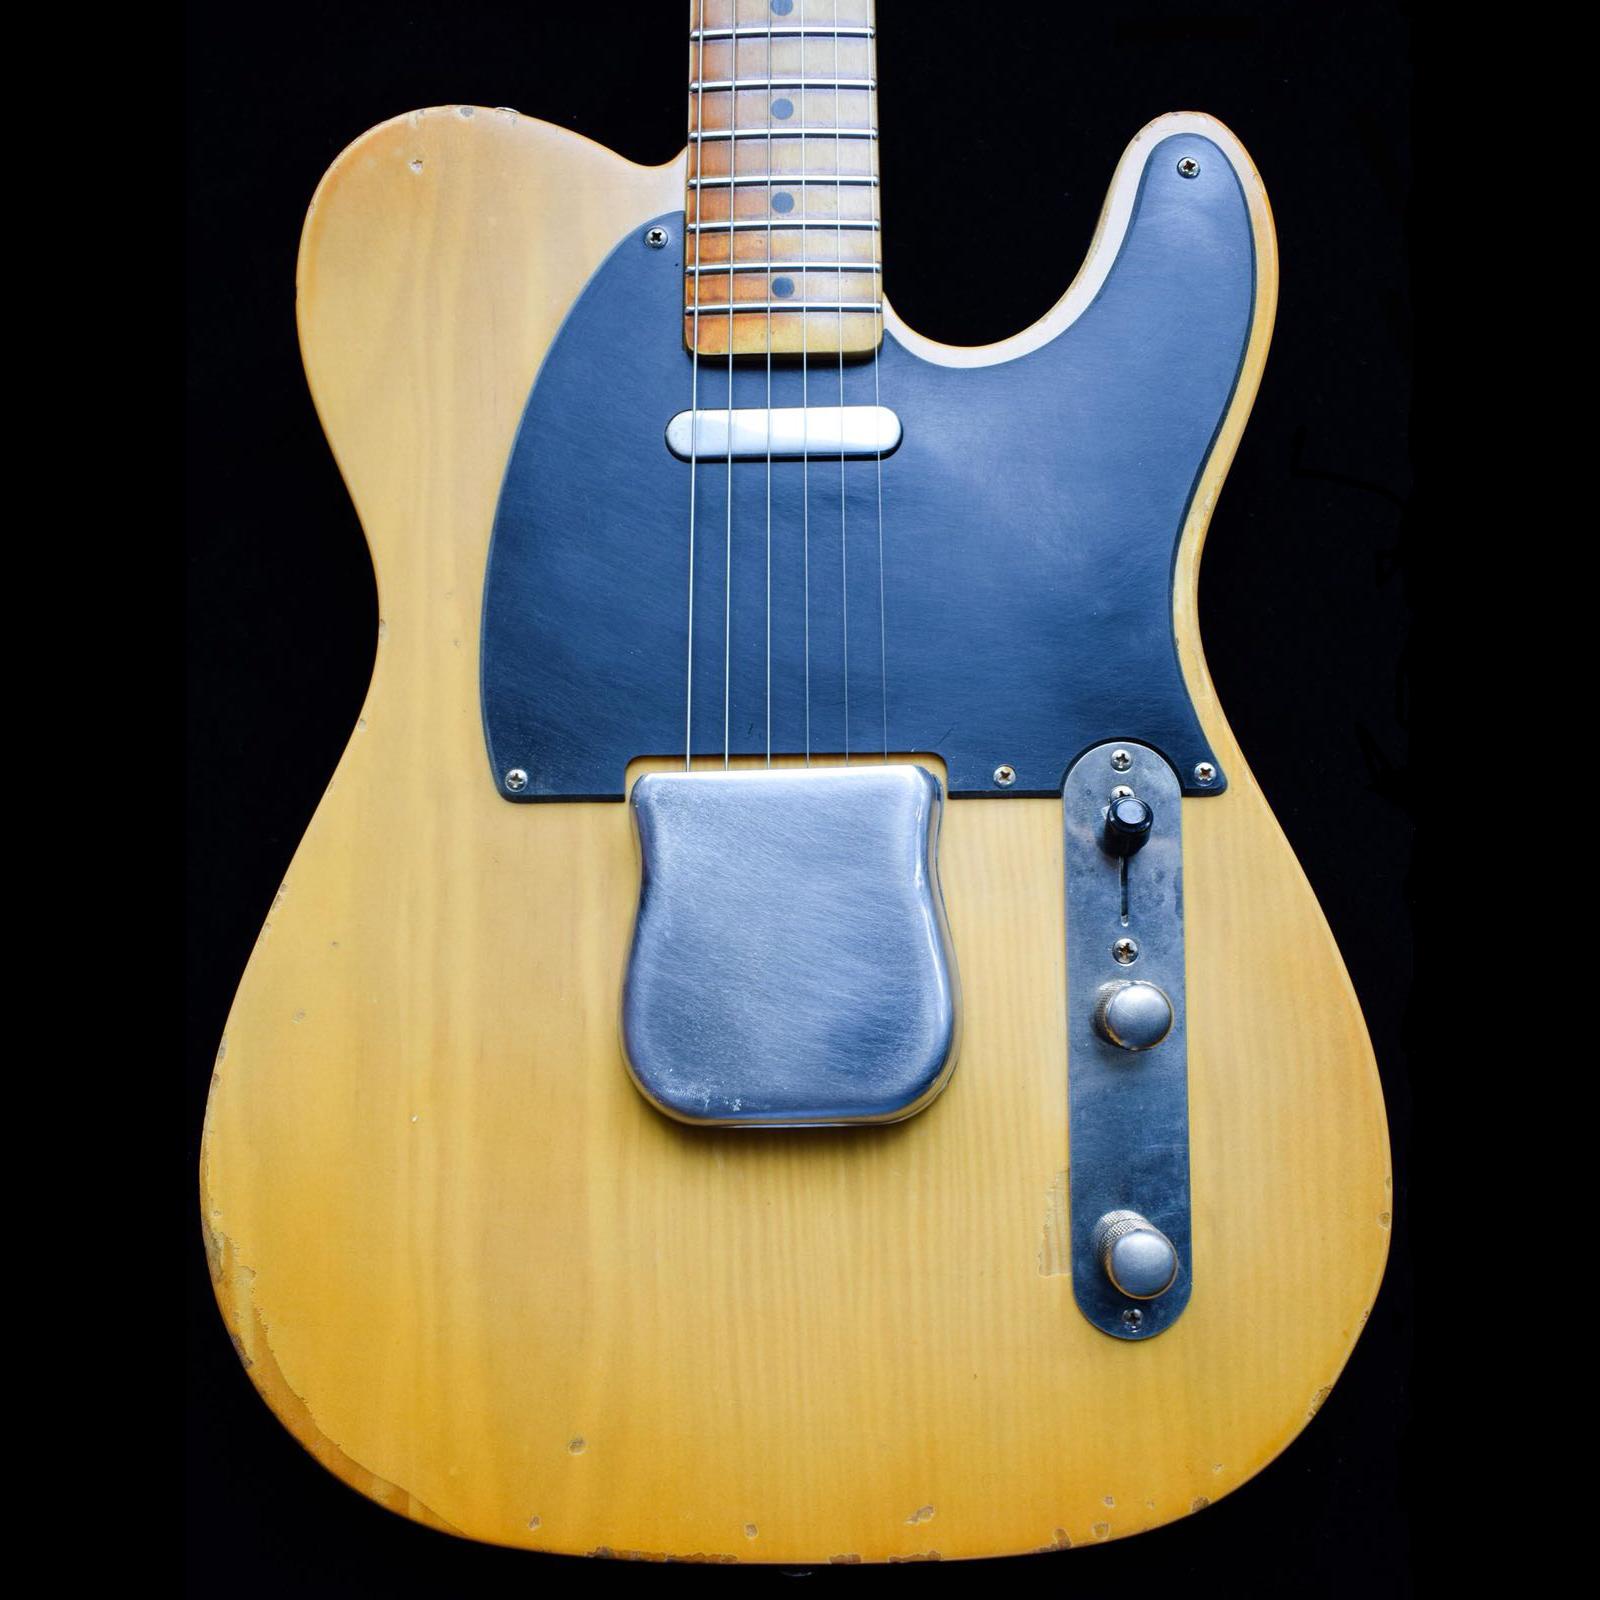 squier classic vibe custom relic telecaster guitar repair nyc. Black Bedroom Furniture Sets. Home Design Ideas